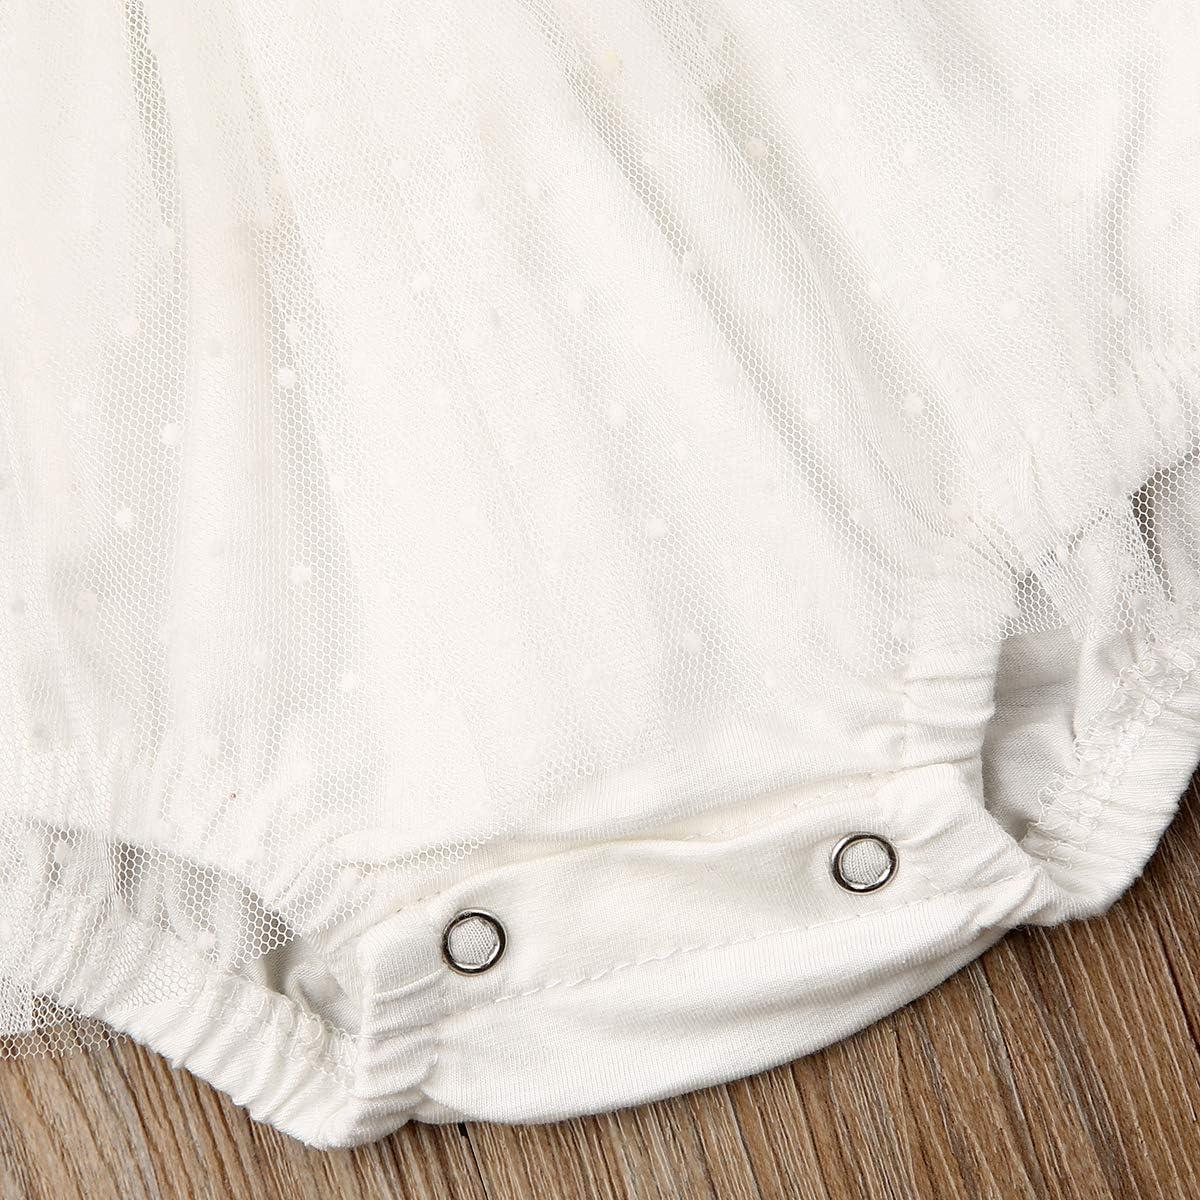 Misown Newborn Infant Baby Girl Princess Dress Bodusuit Bib Lace V Neck Sleeveless Backless Romper Tutu Wedding Dress